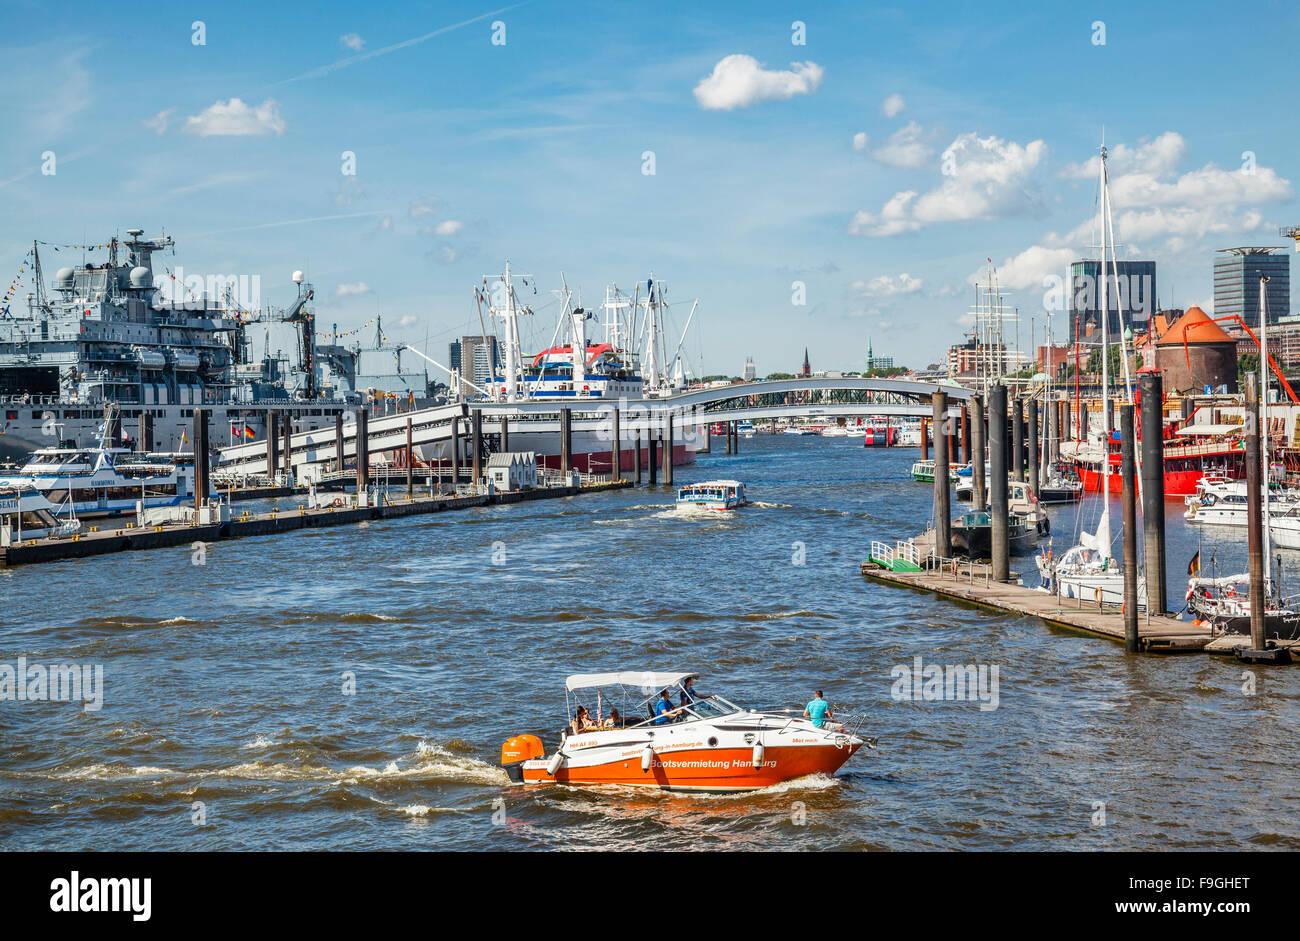 Germany, Free and Hanseatic City of Hamburg, Port of Hamburg, Hamburger Hafen, view of the Überseebrücke - Stock Image